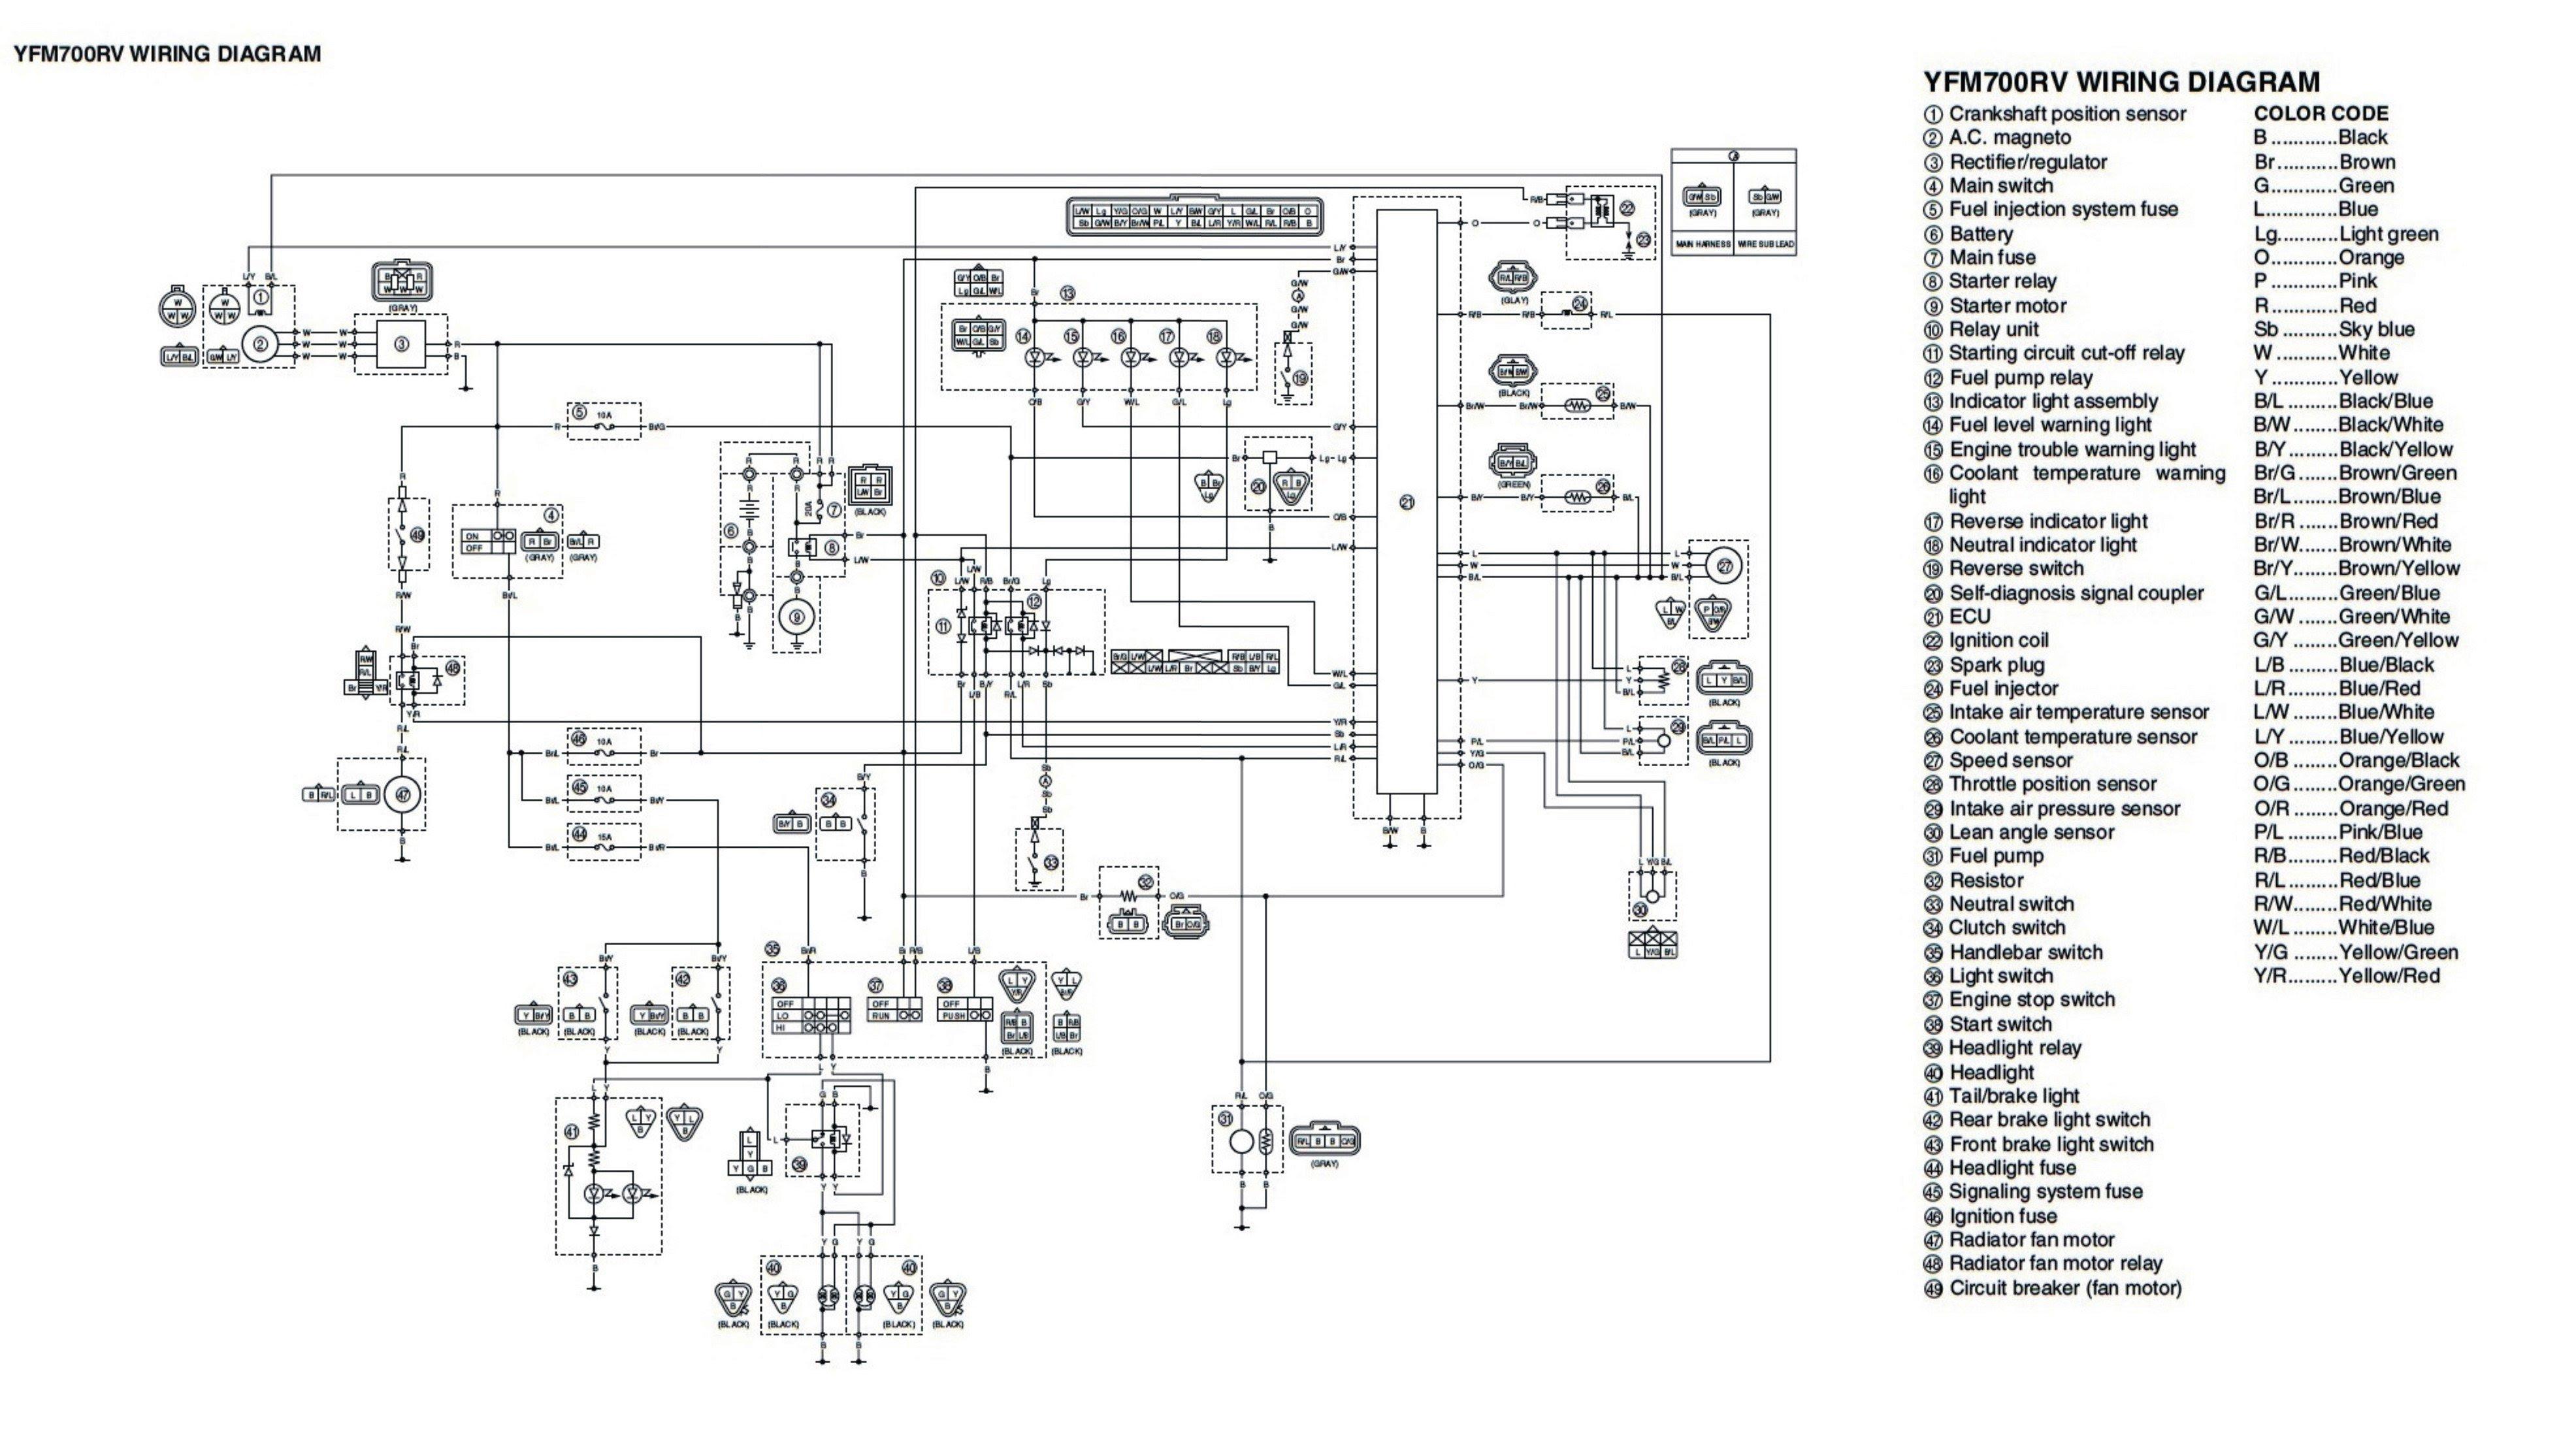 Wiring Diagram For Kodiak Ar821 Argo Relay Wiring Diagram For Wiring Diagram Schematics